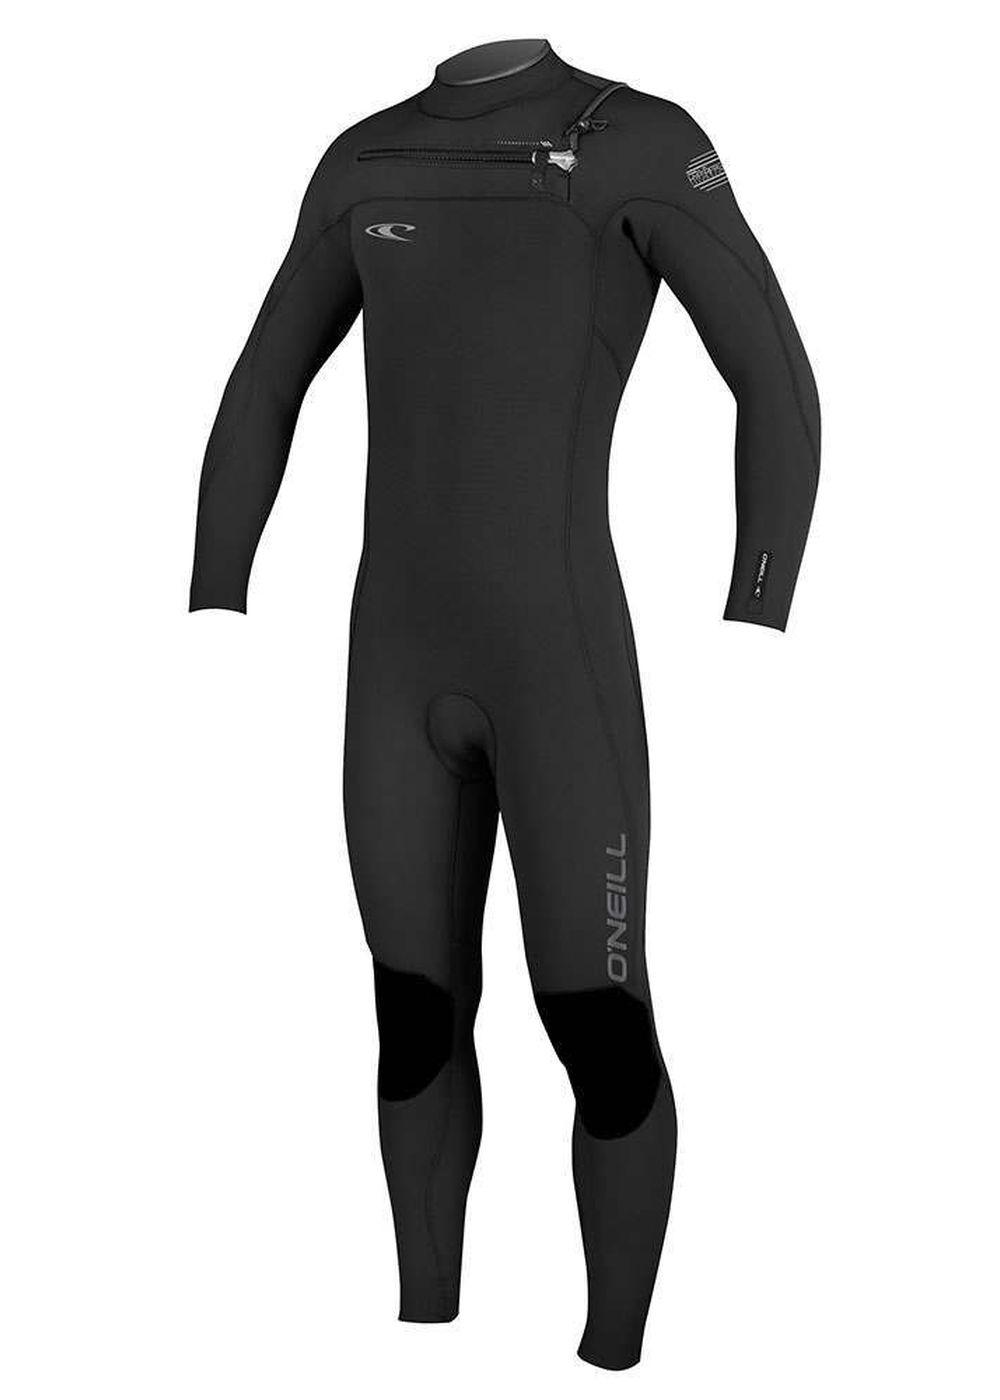 Oneill Hyperfreak Fz 5/4 Gbs Wetsuit 2017 Black Picture